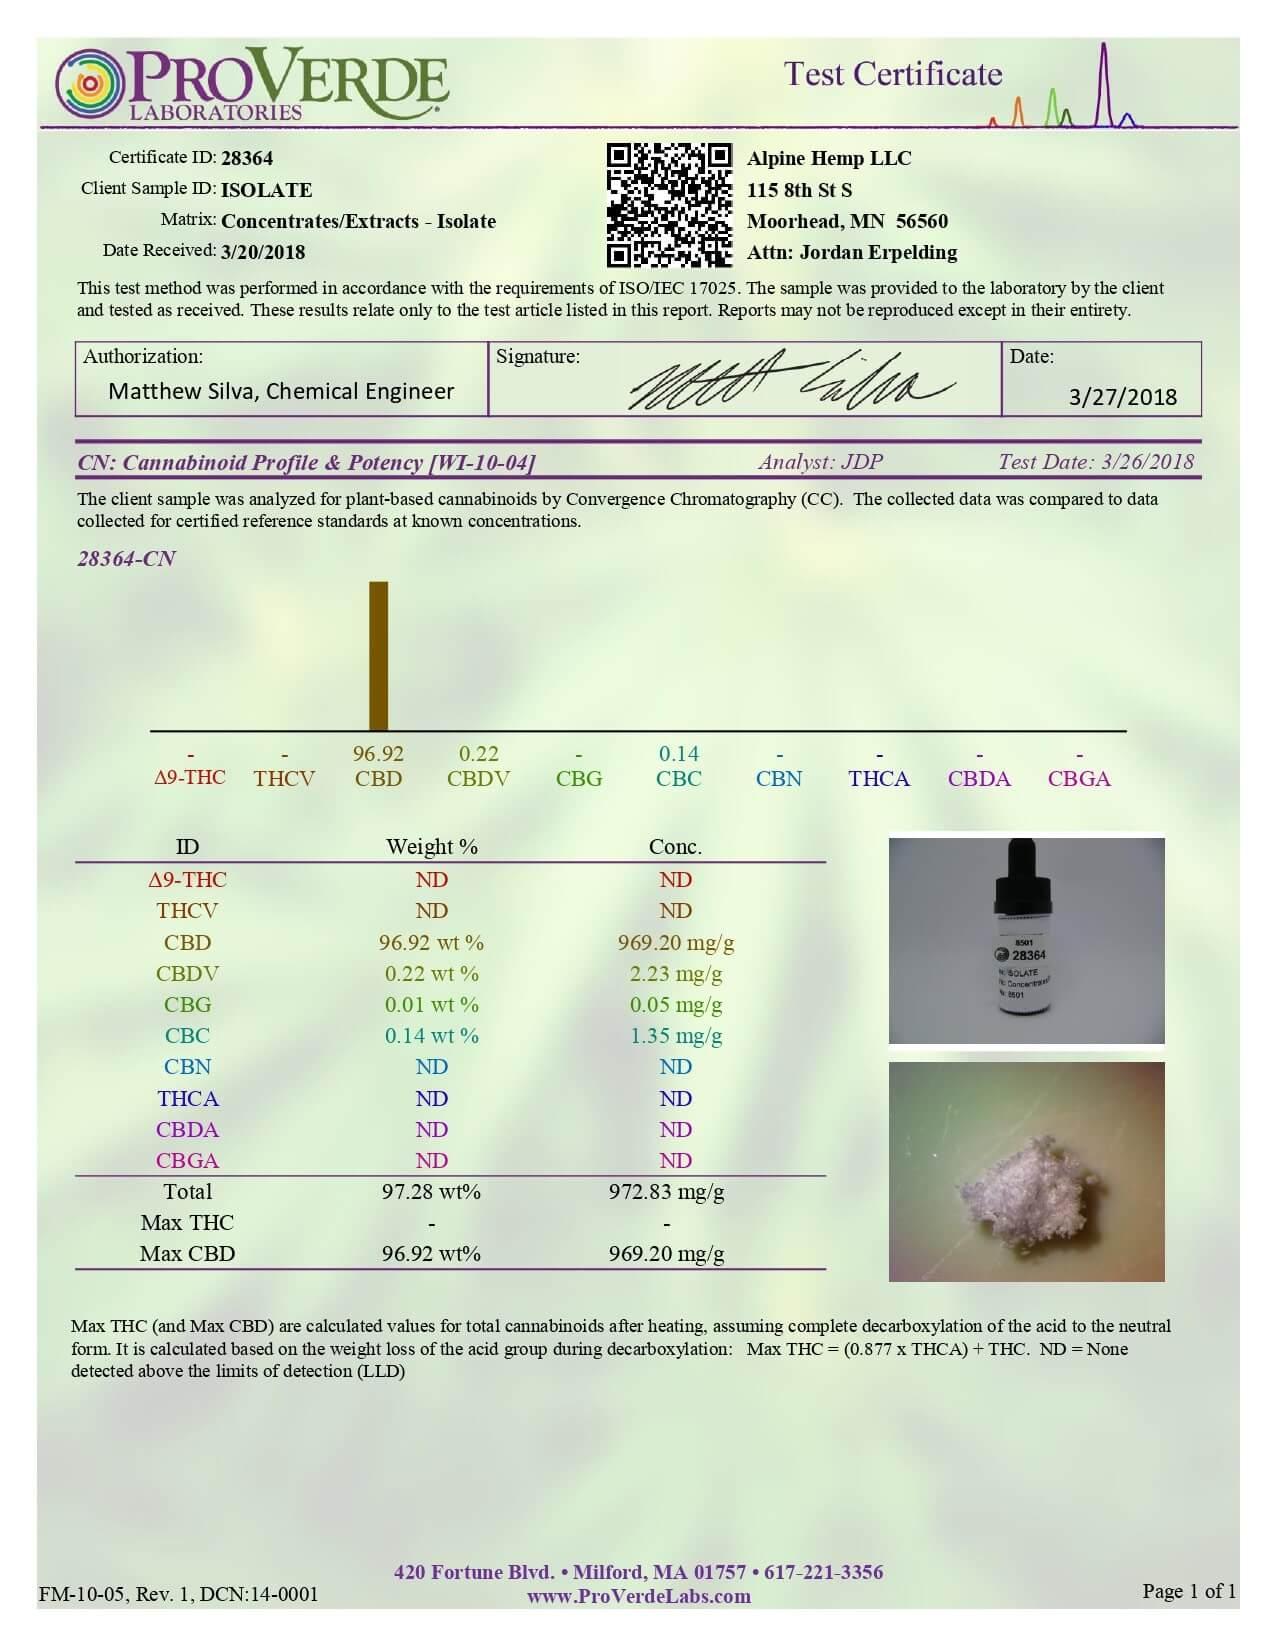 Alpine Hemp CBD Concentrate Isolate Lab Report